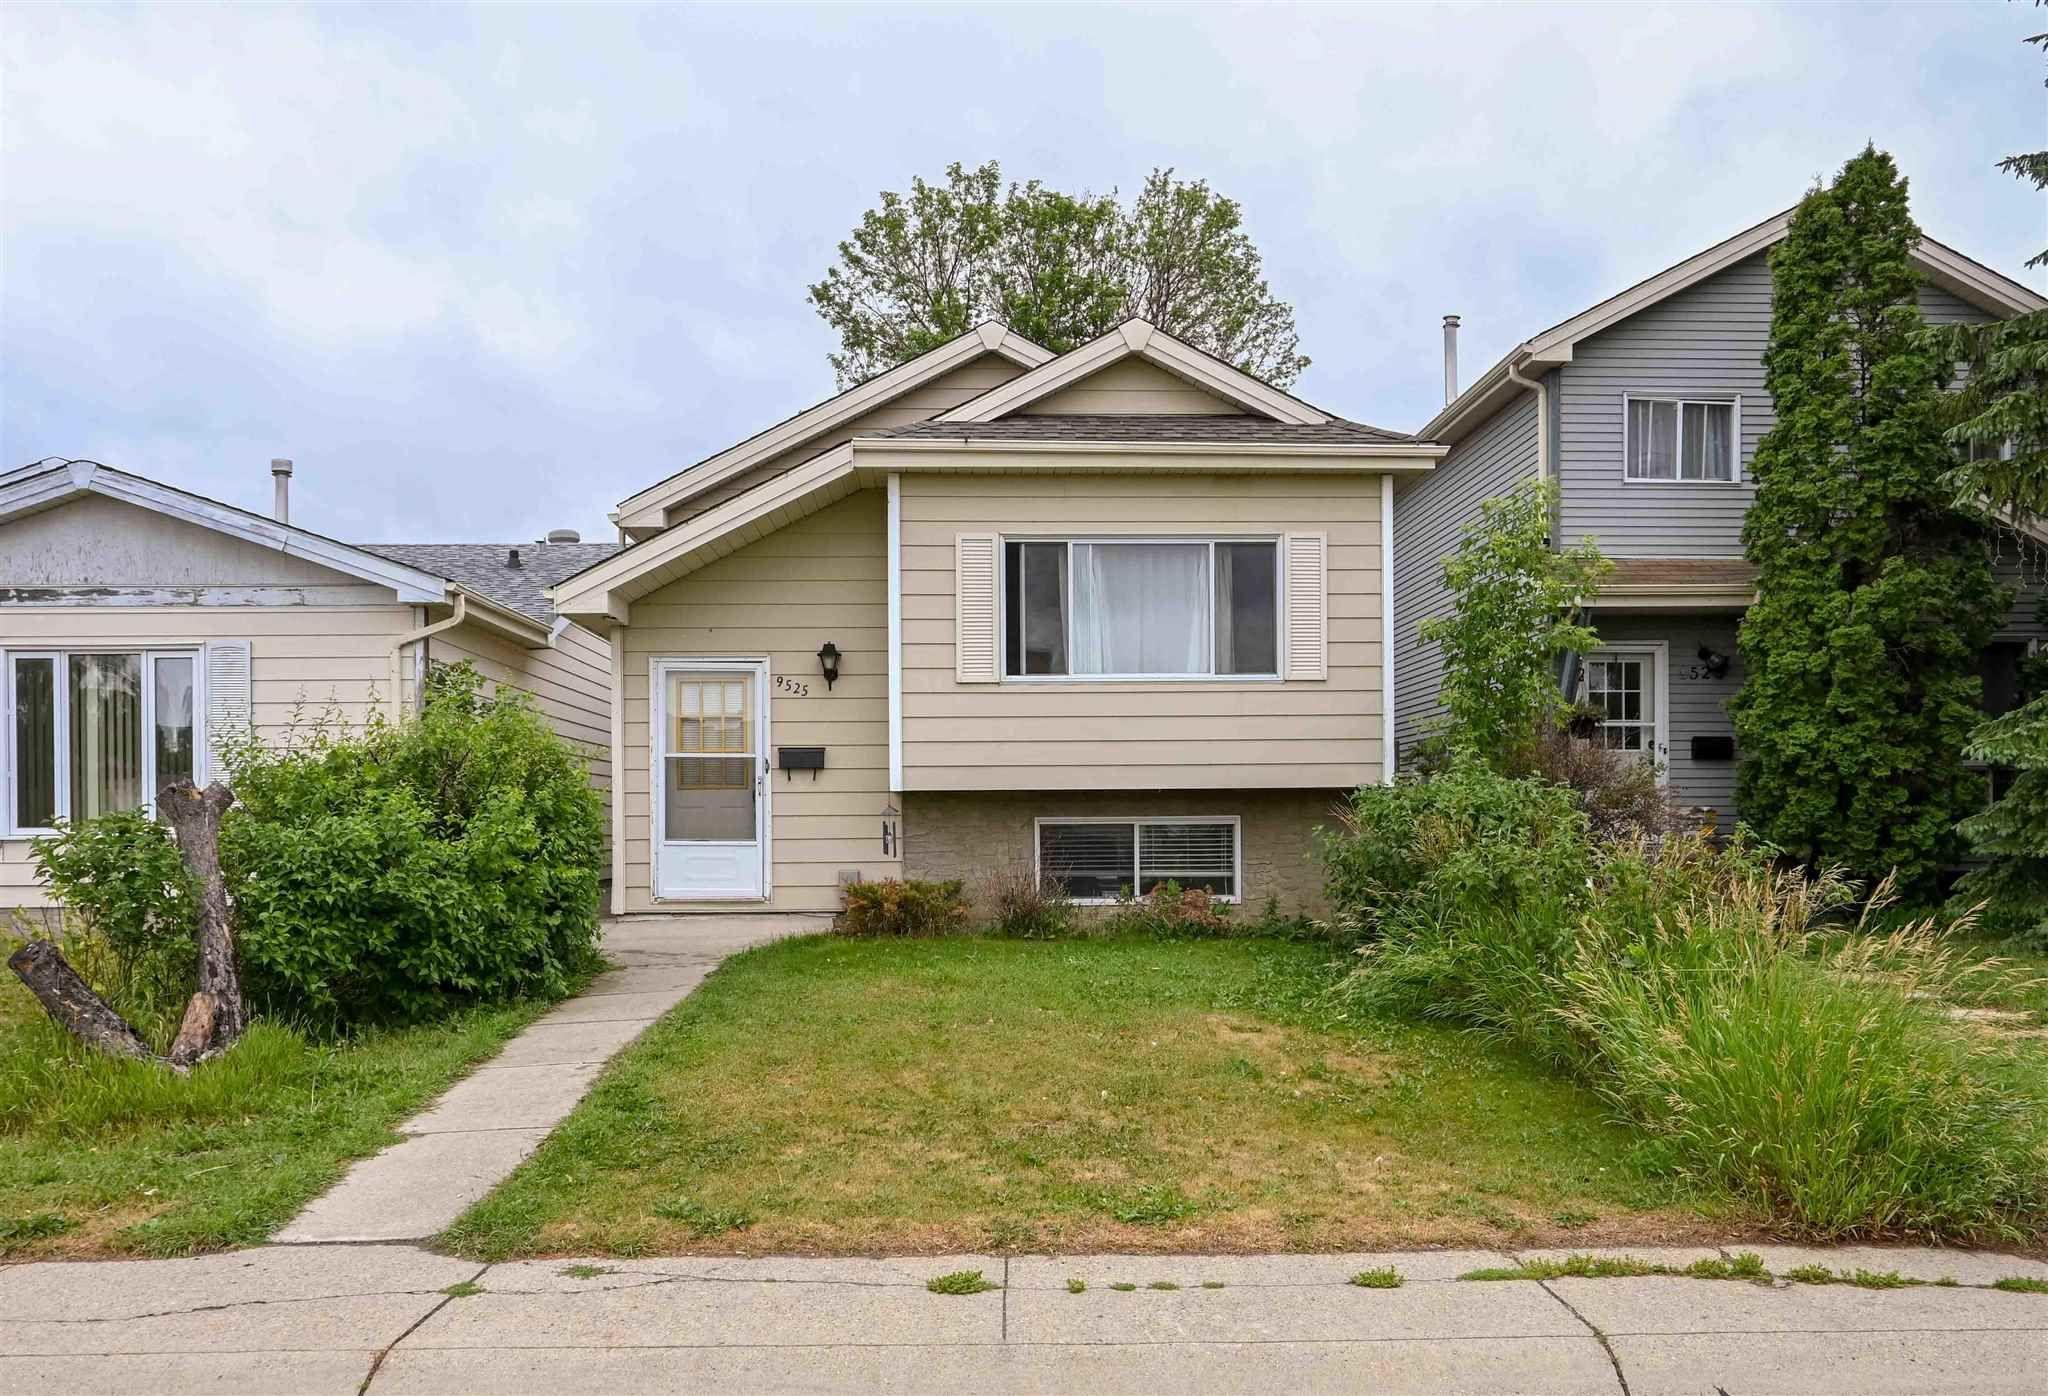 Main Photo: 9525 185 Street in Edmonton: Zone 20 House for sale : MLS®# E4254908